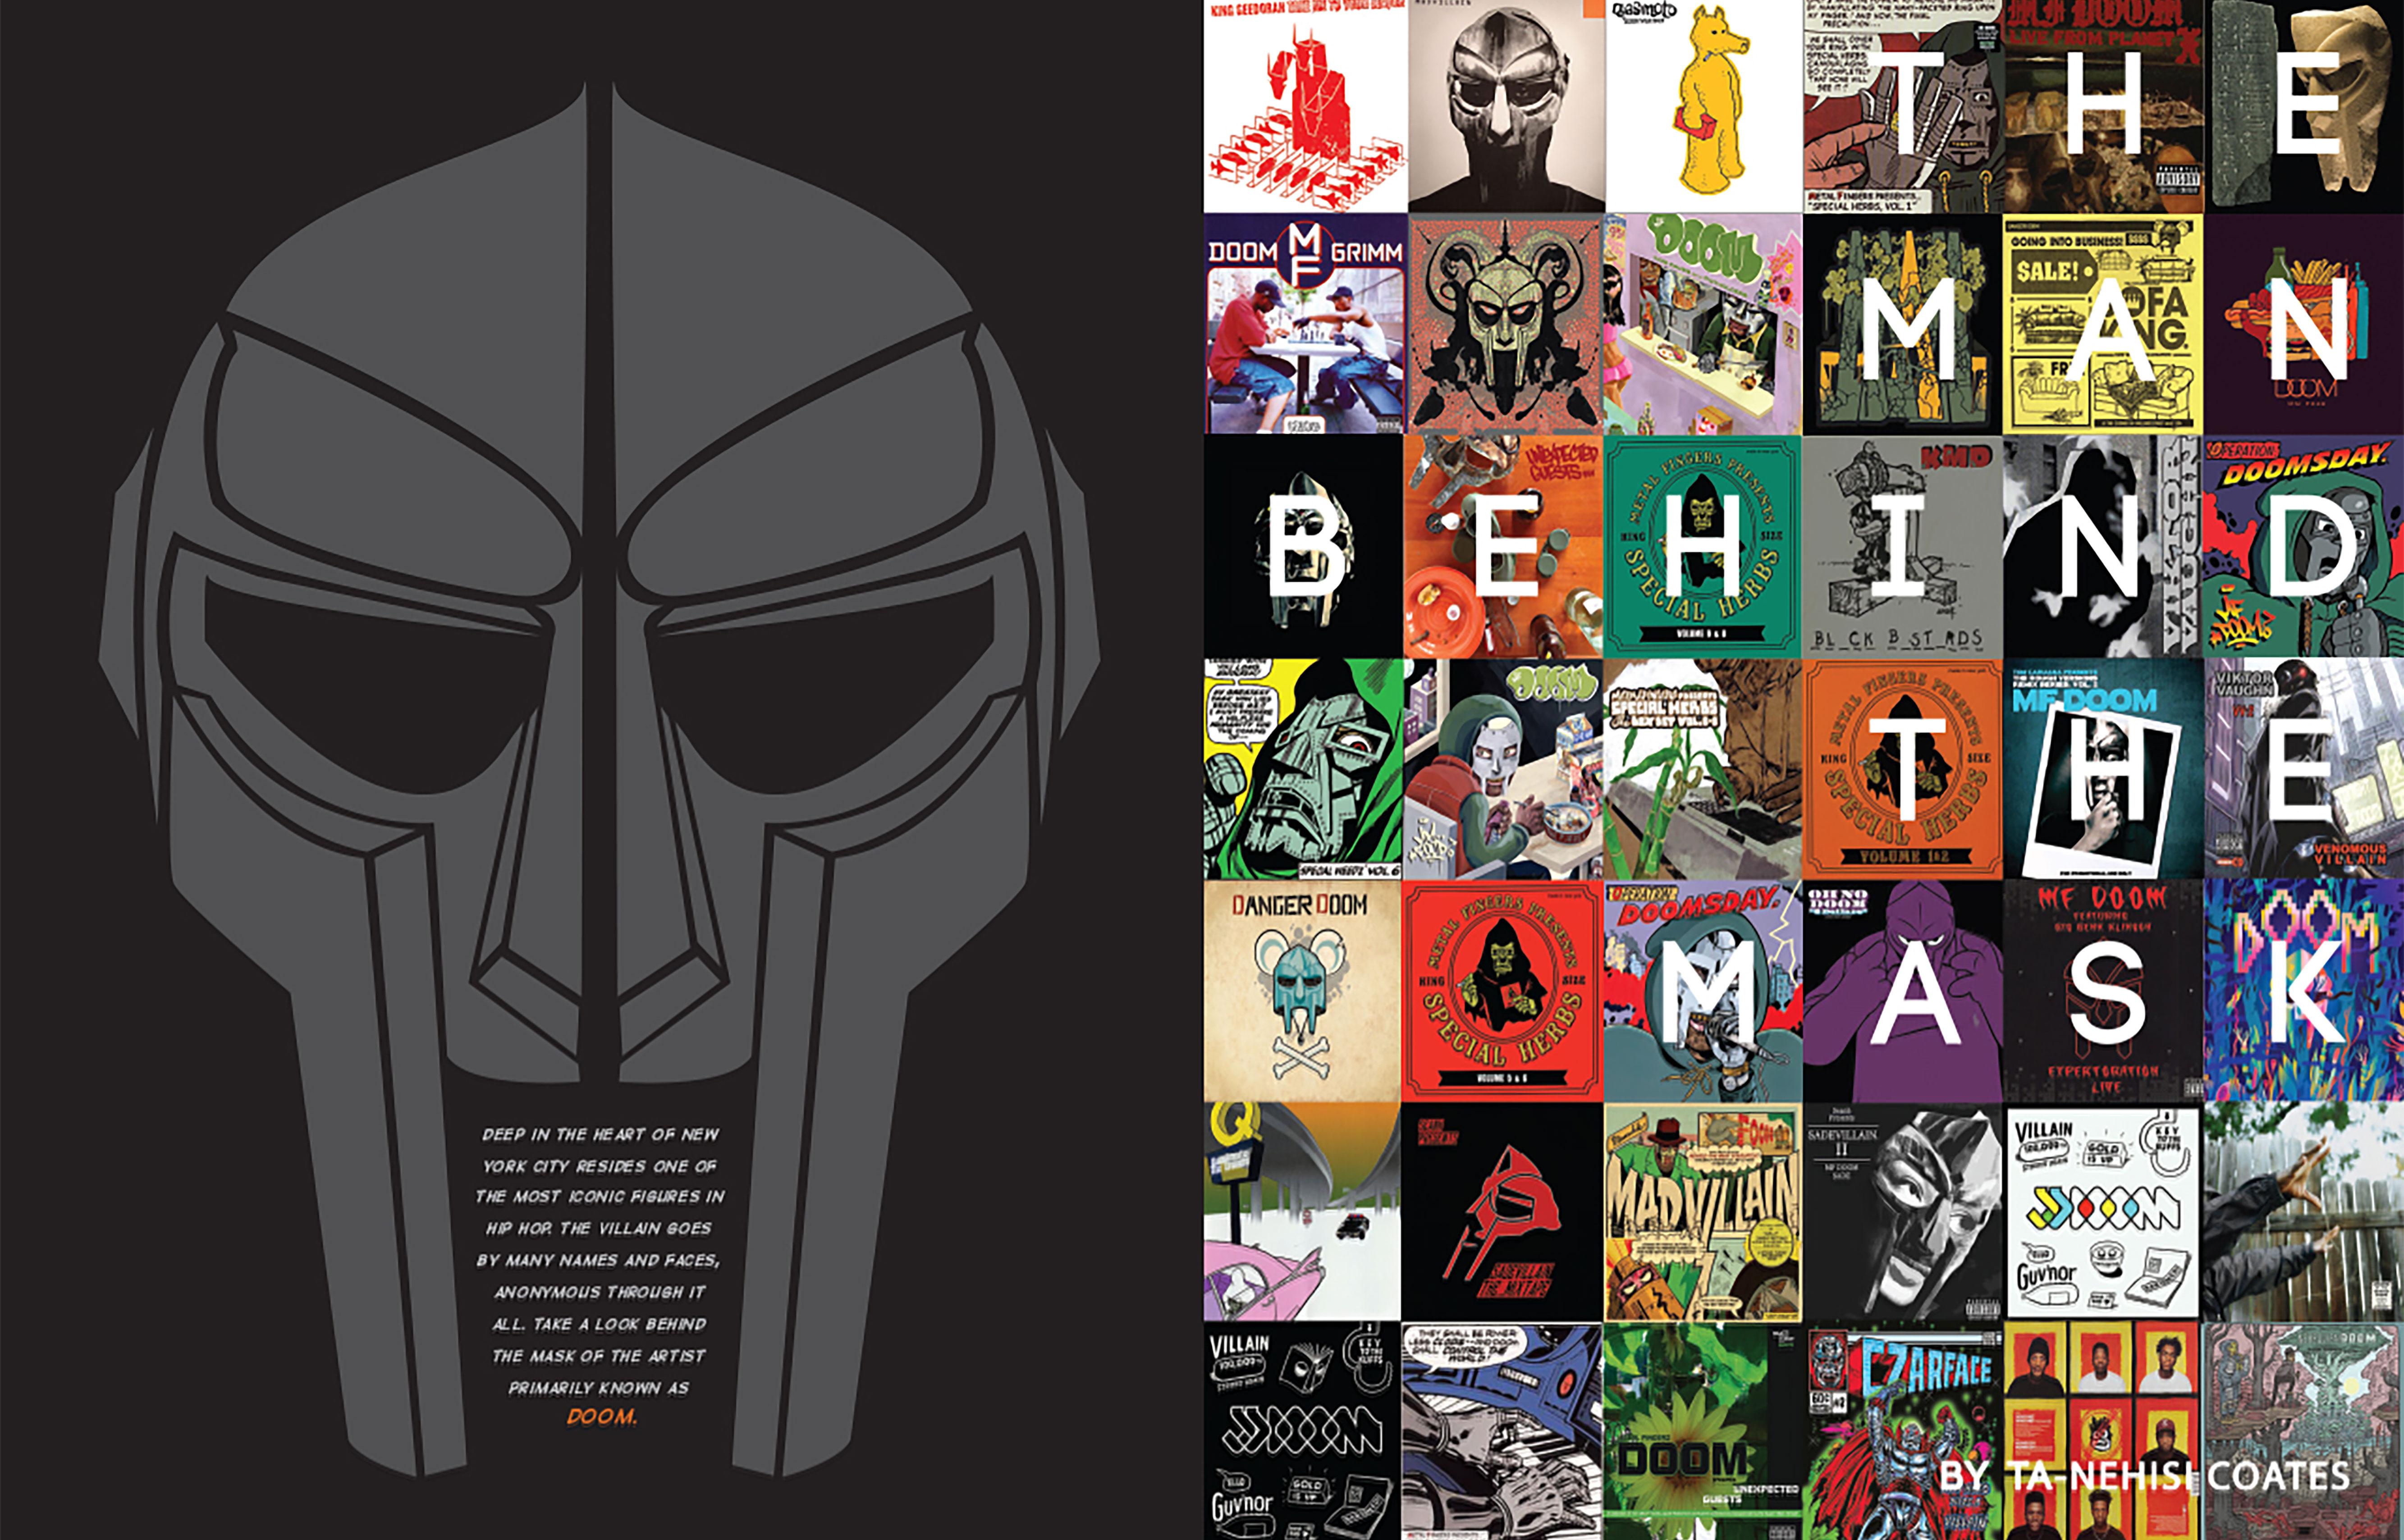 cover spread for editorial